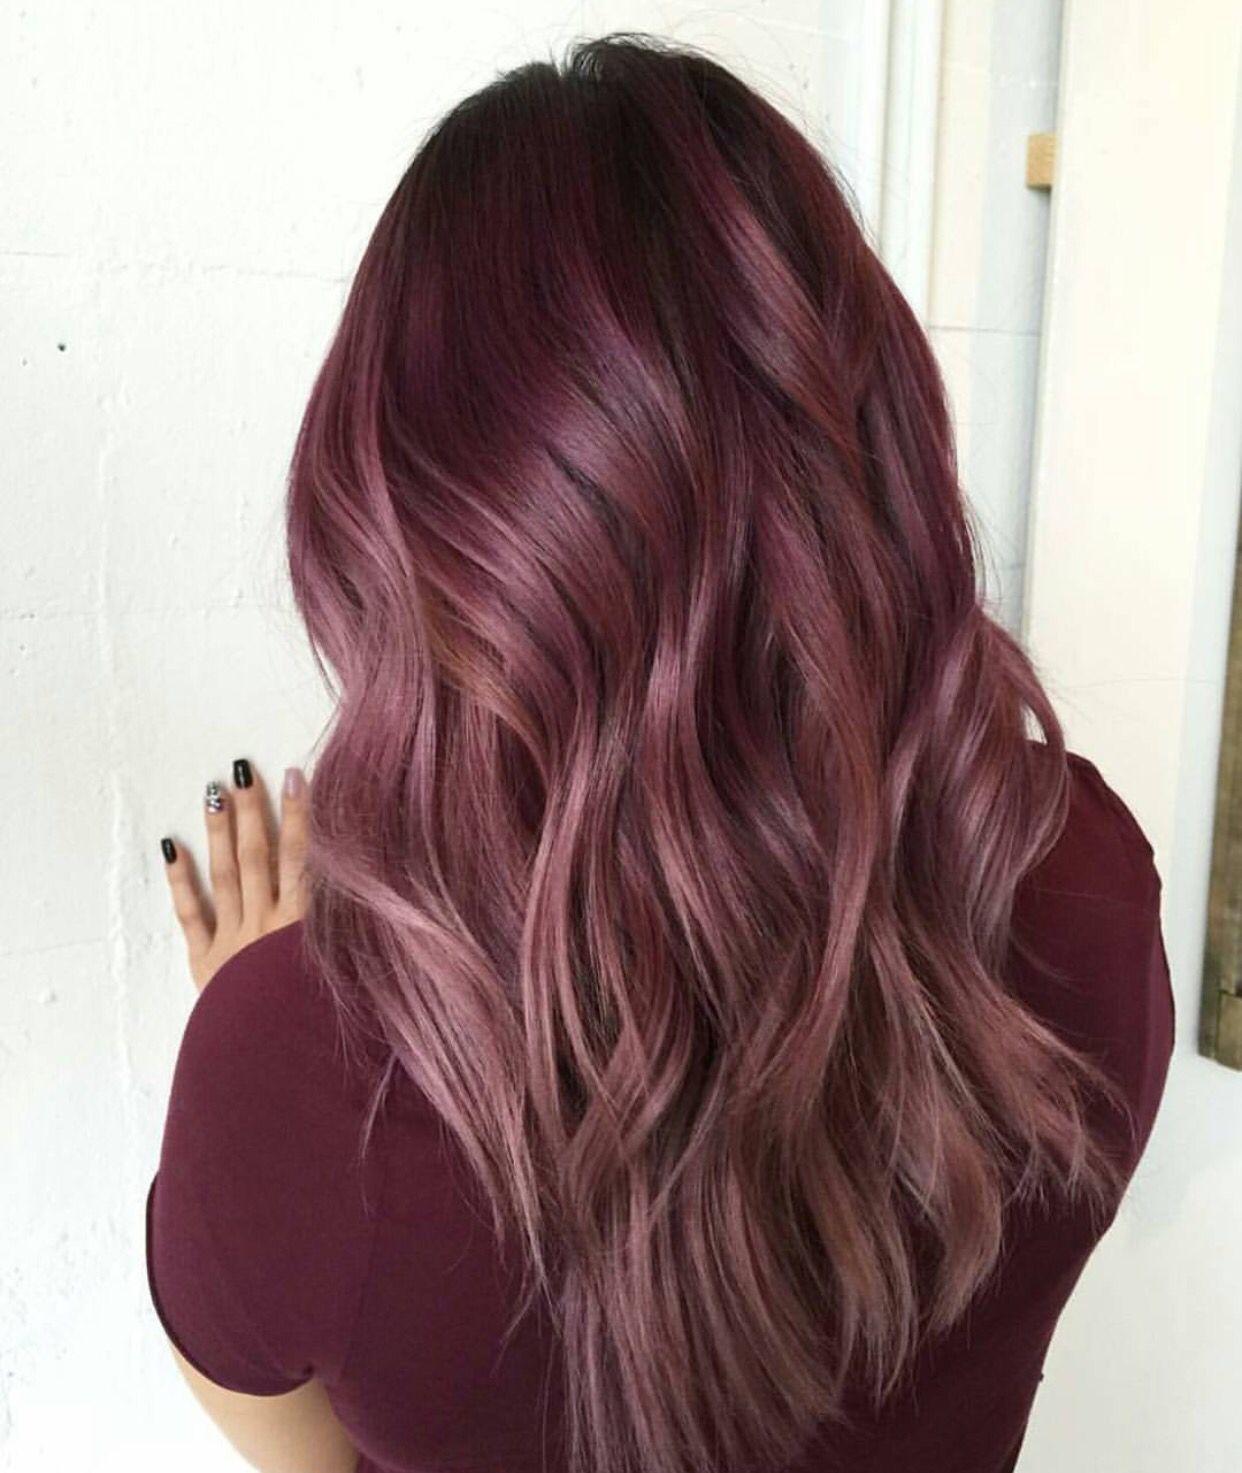 Pin By Katherine On Coiffed Hair Styles Maroon Hair Maroon Hair Colors